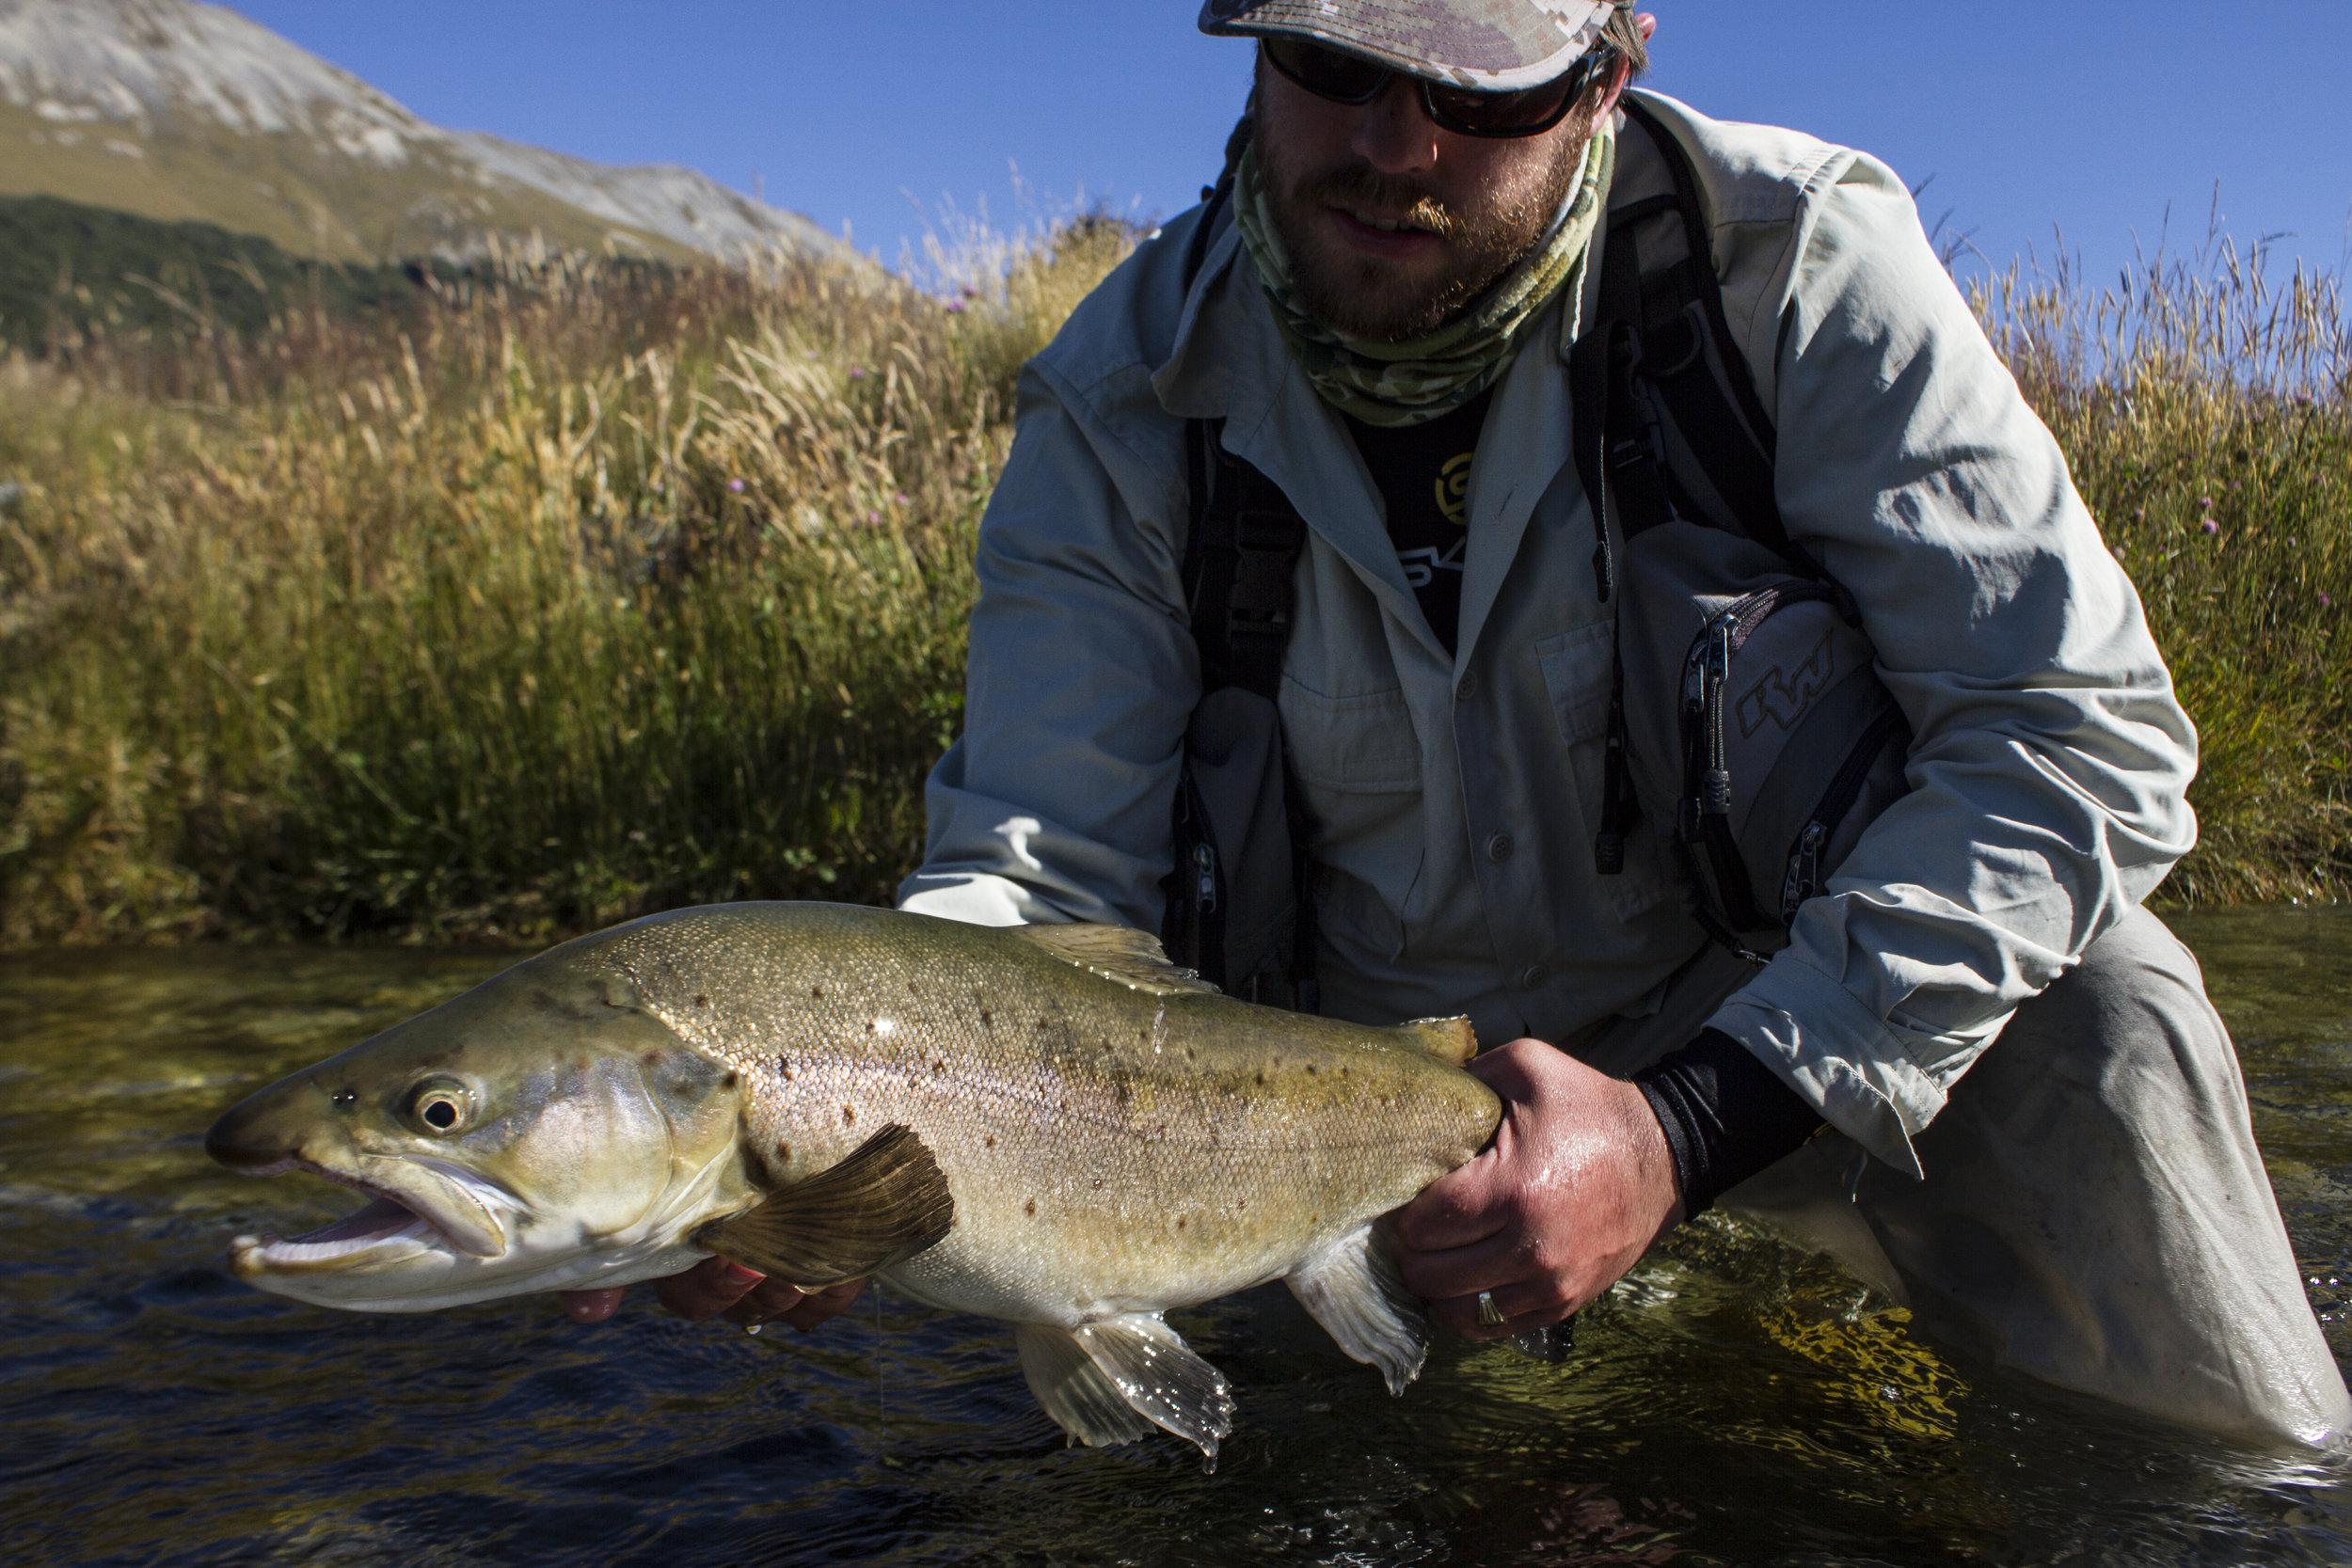 Big New Zealand brown trout James Wilkinson